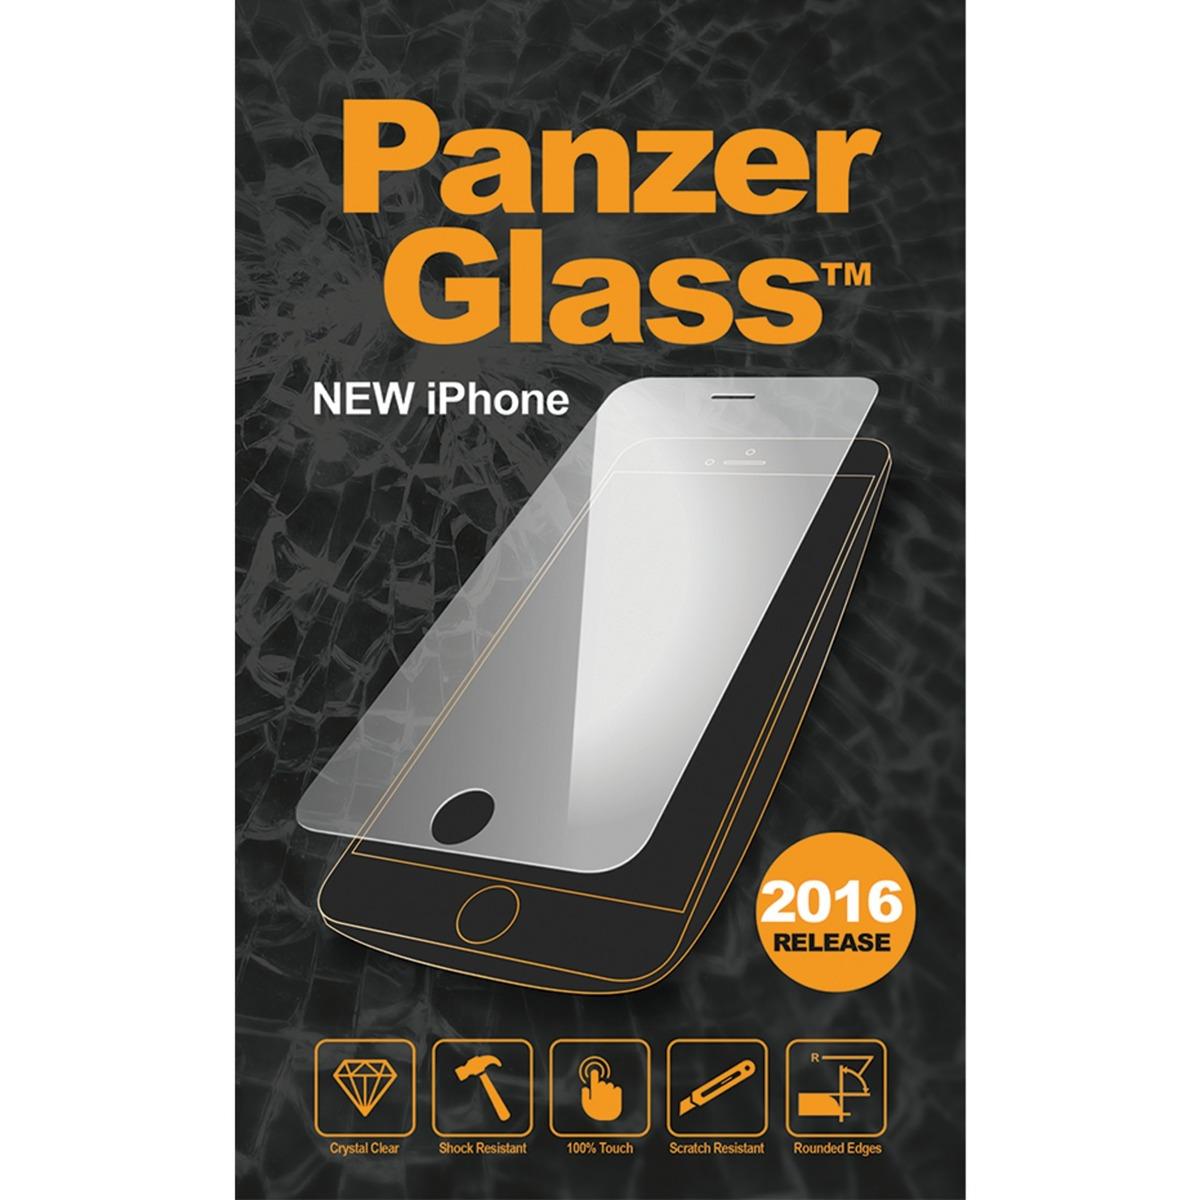 2003 Clear screen protector iPhone 7 1pieza(s) protector de pantalla, Película protectora